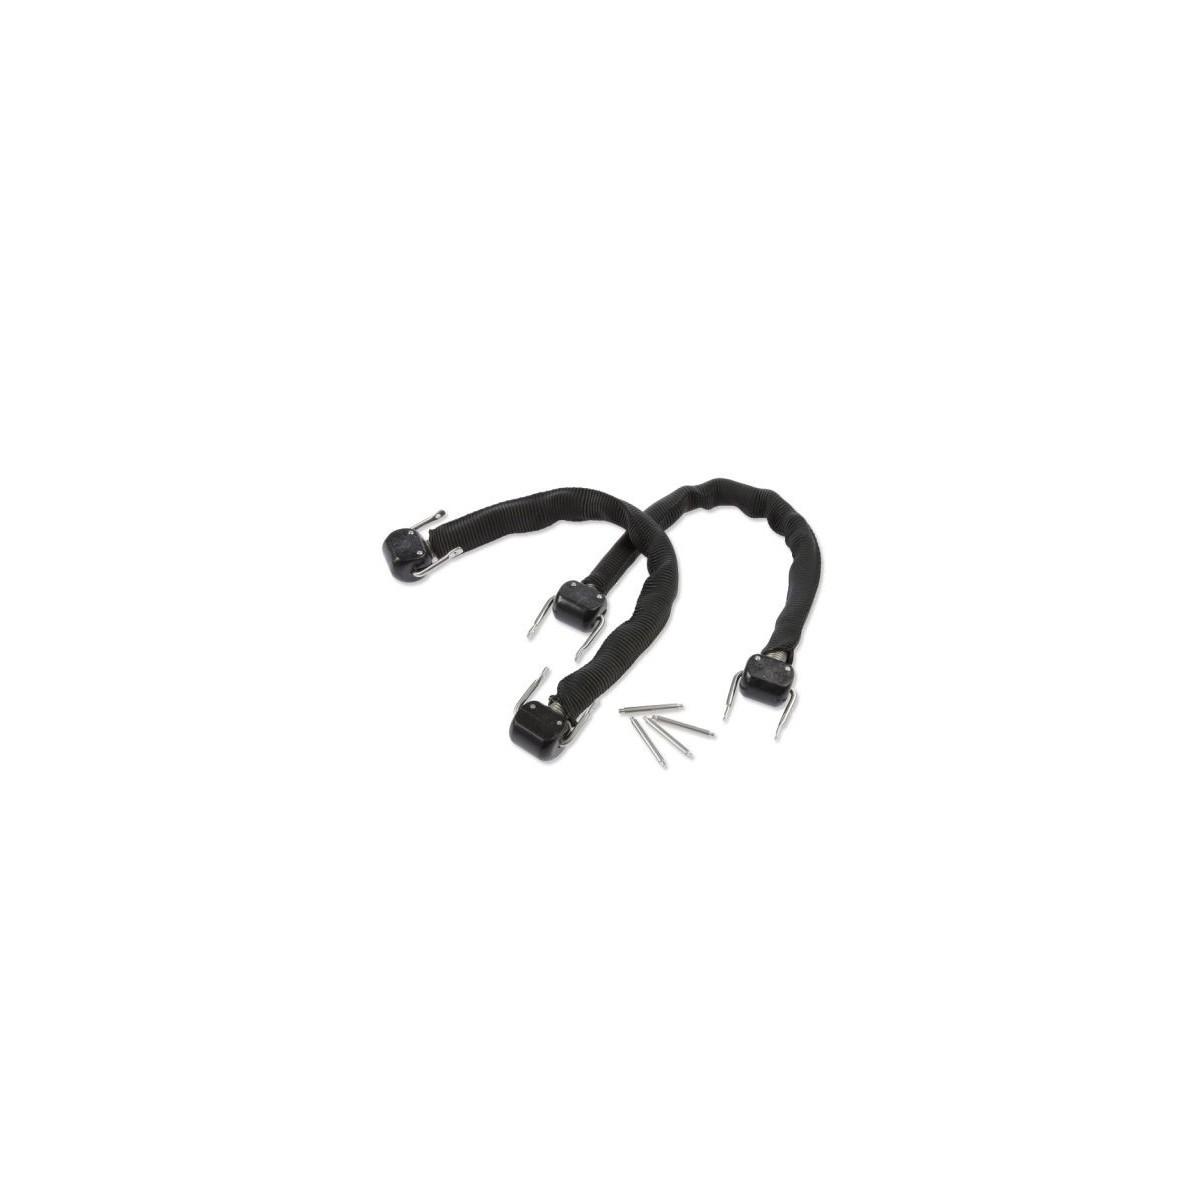 Scubapro spare / replacement Jet fin strap